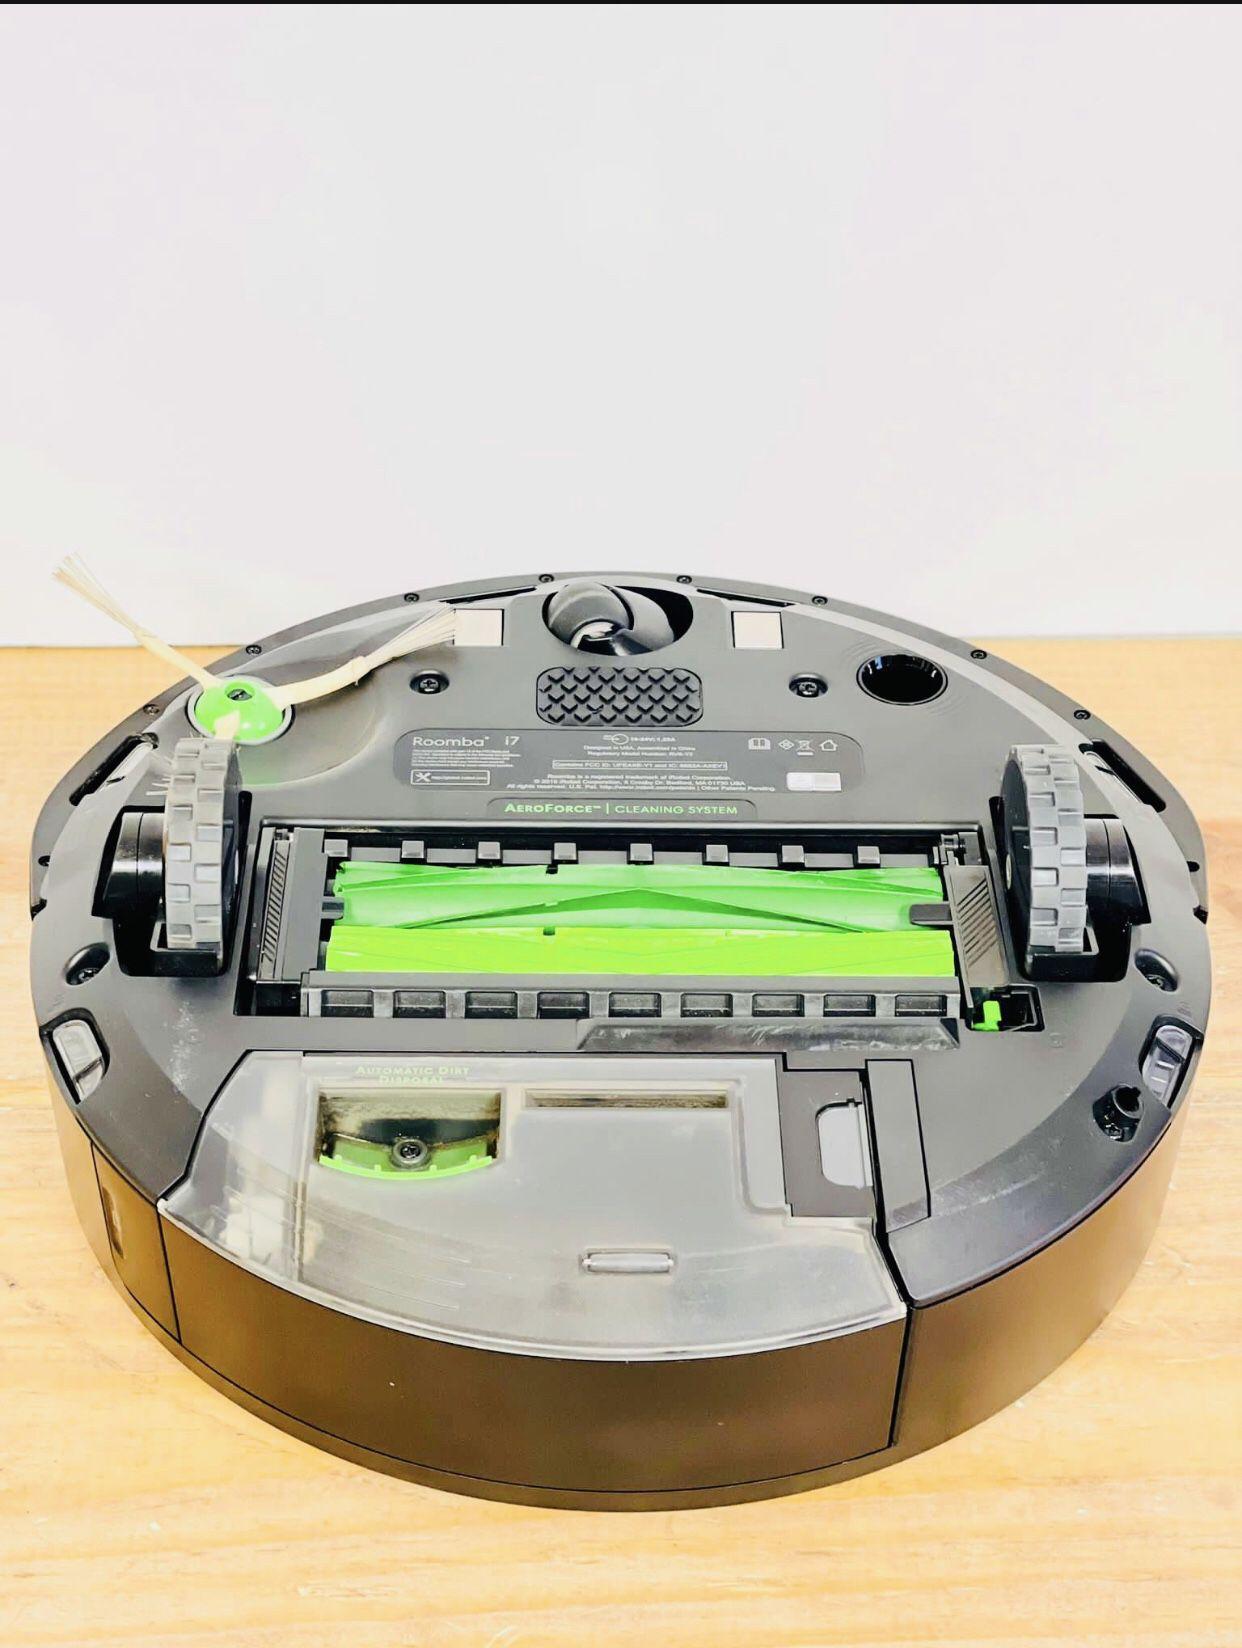 I Robot Romana i7 Self Cleaning Robot Vacuum